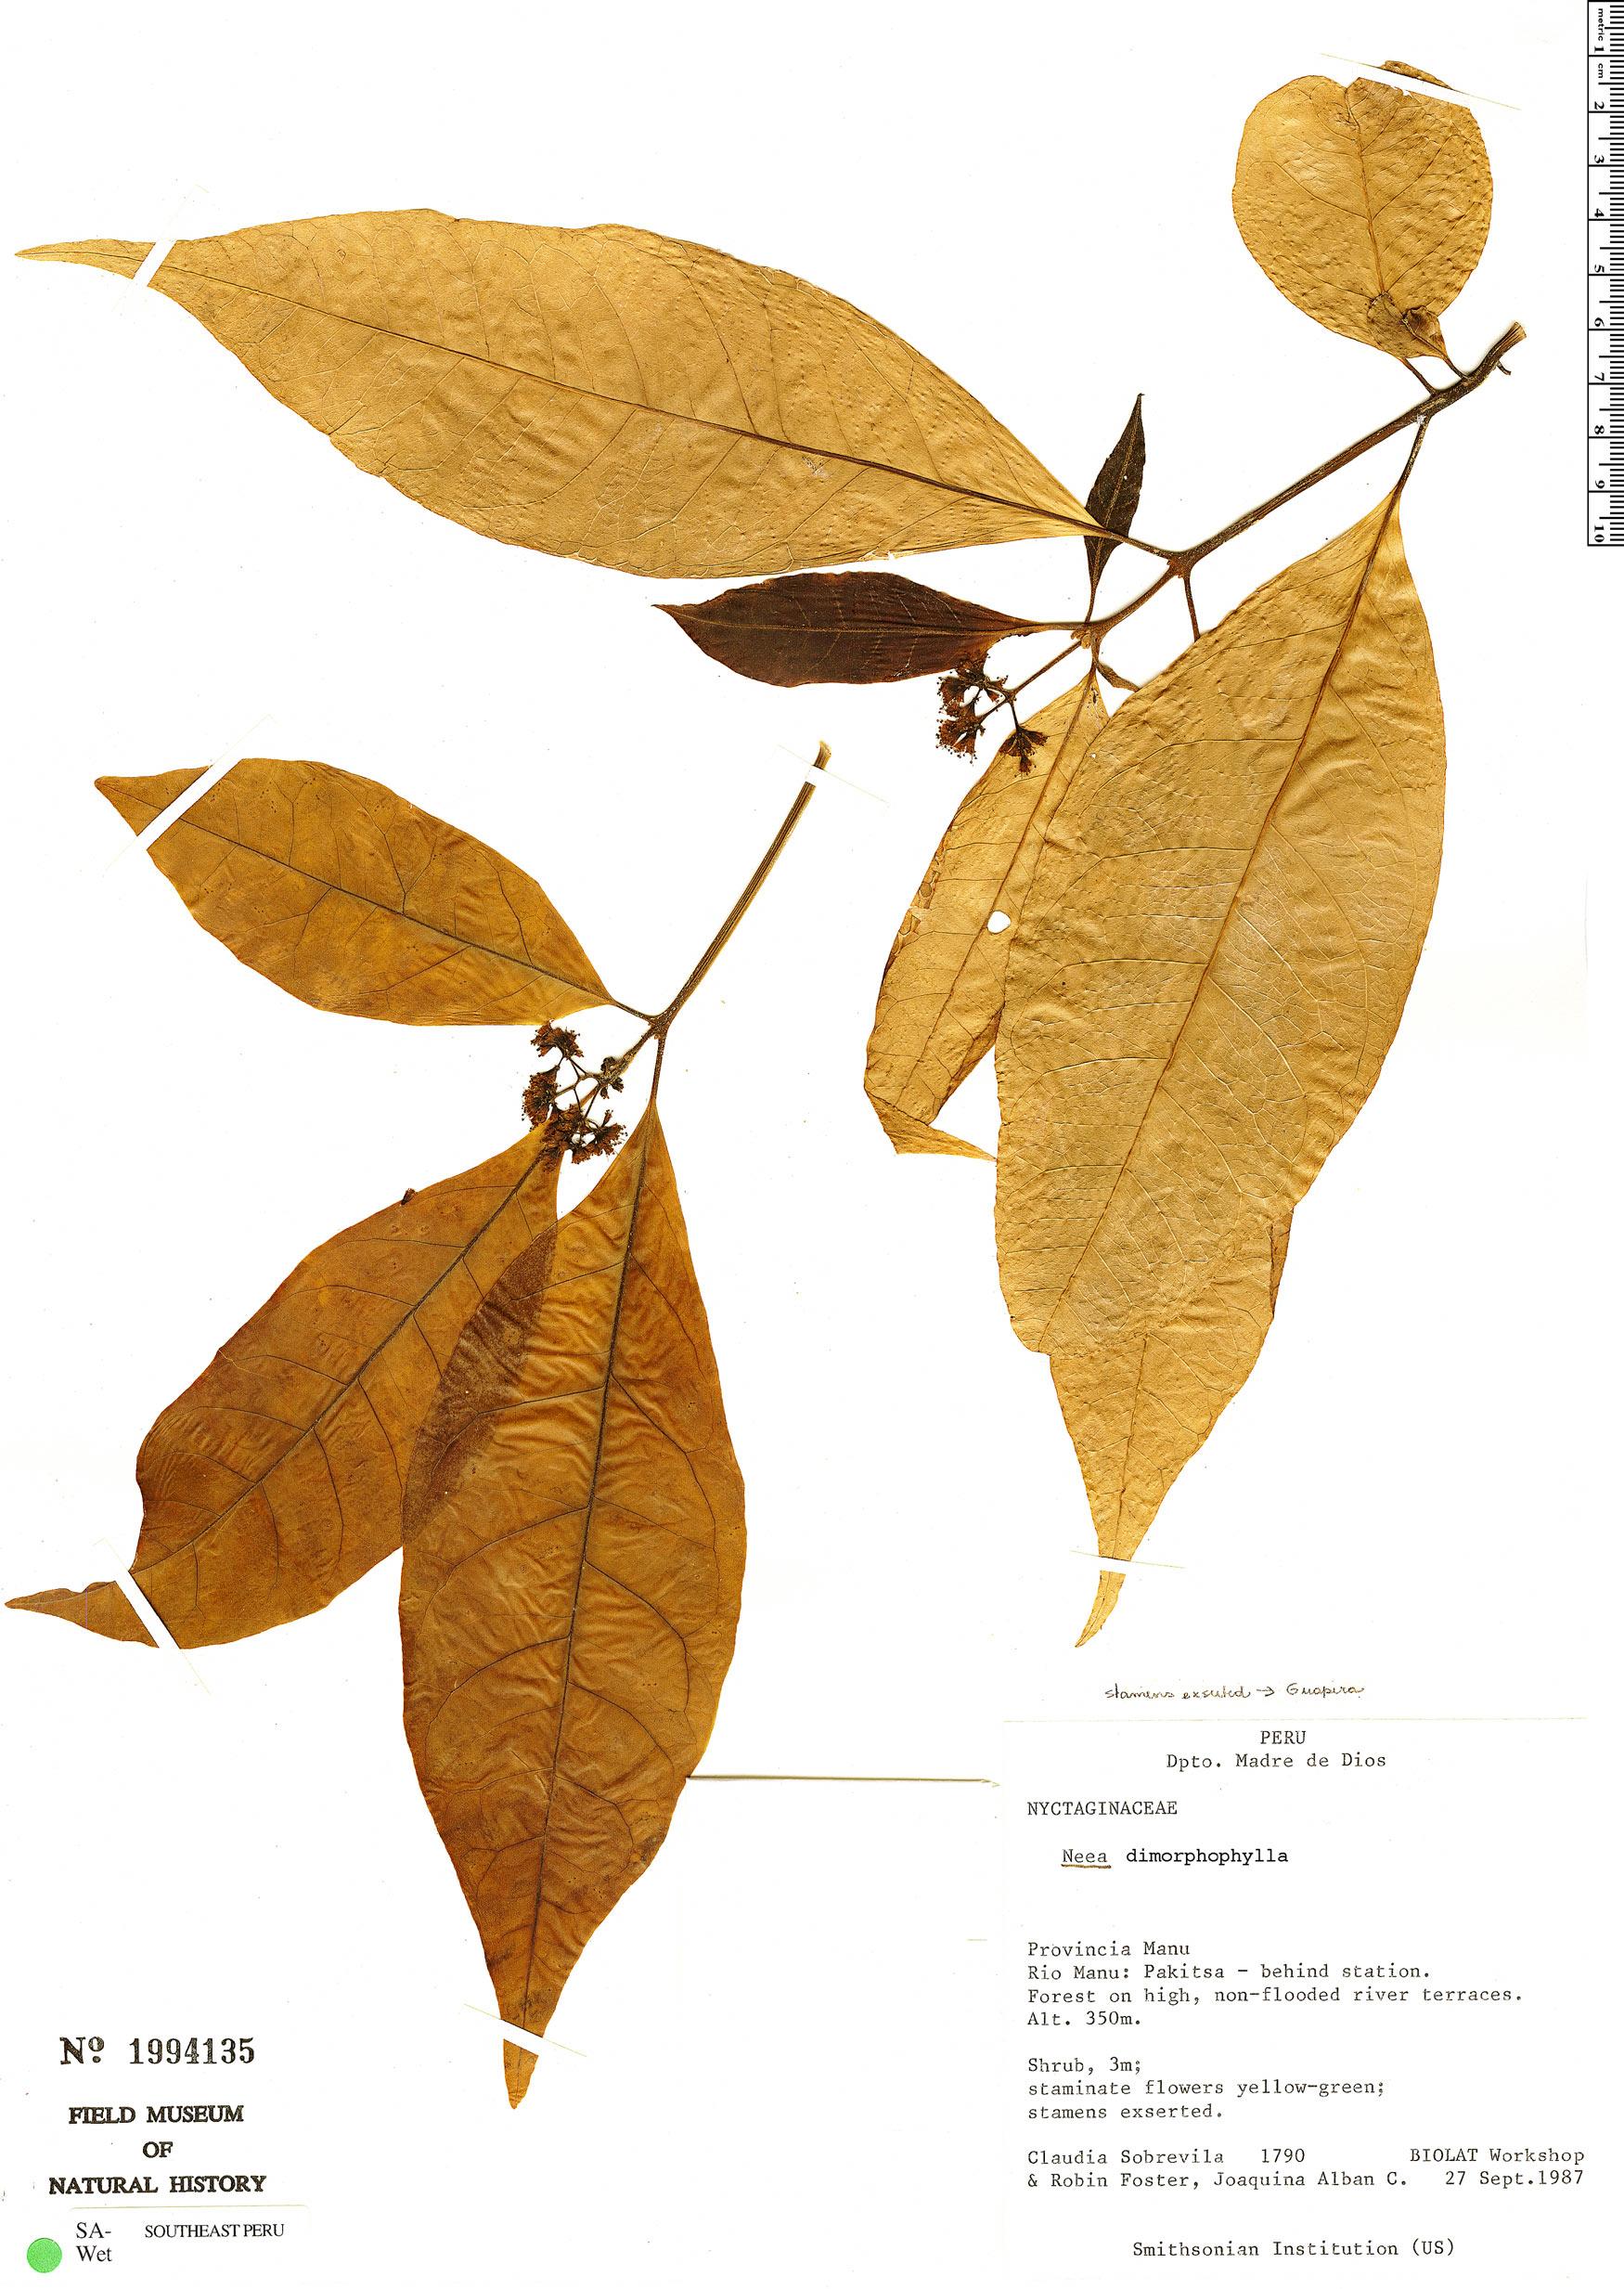 Specimen: Neea dimorphophylla